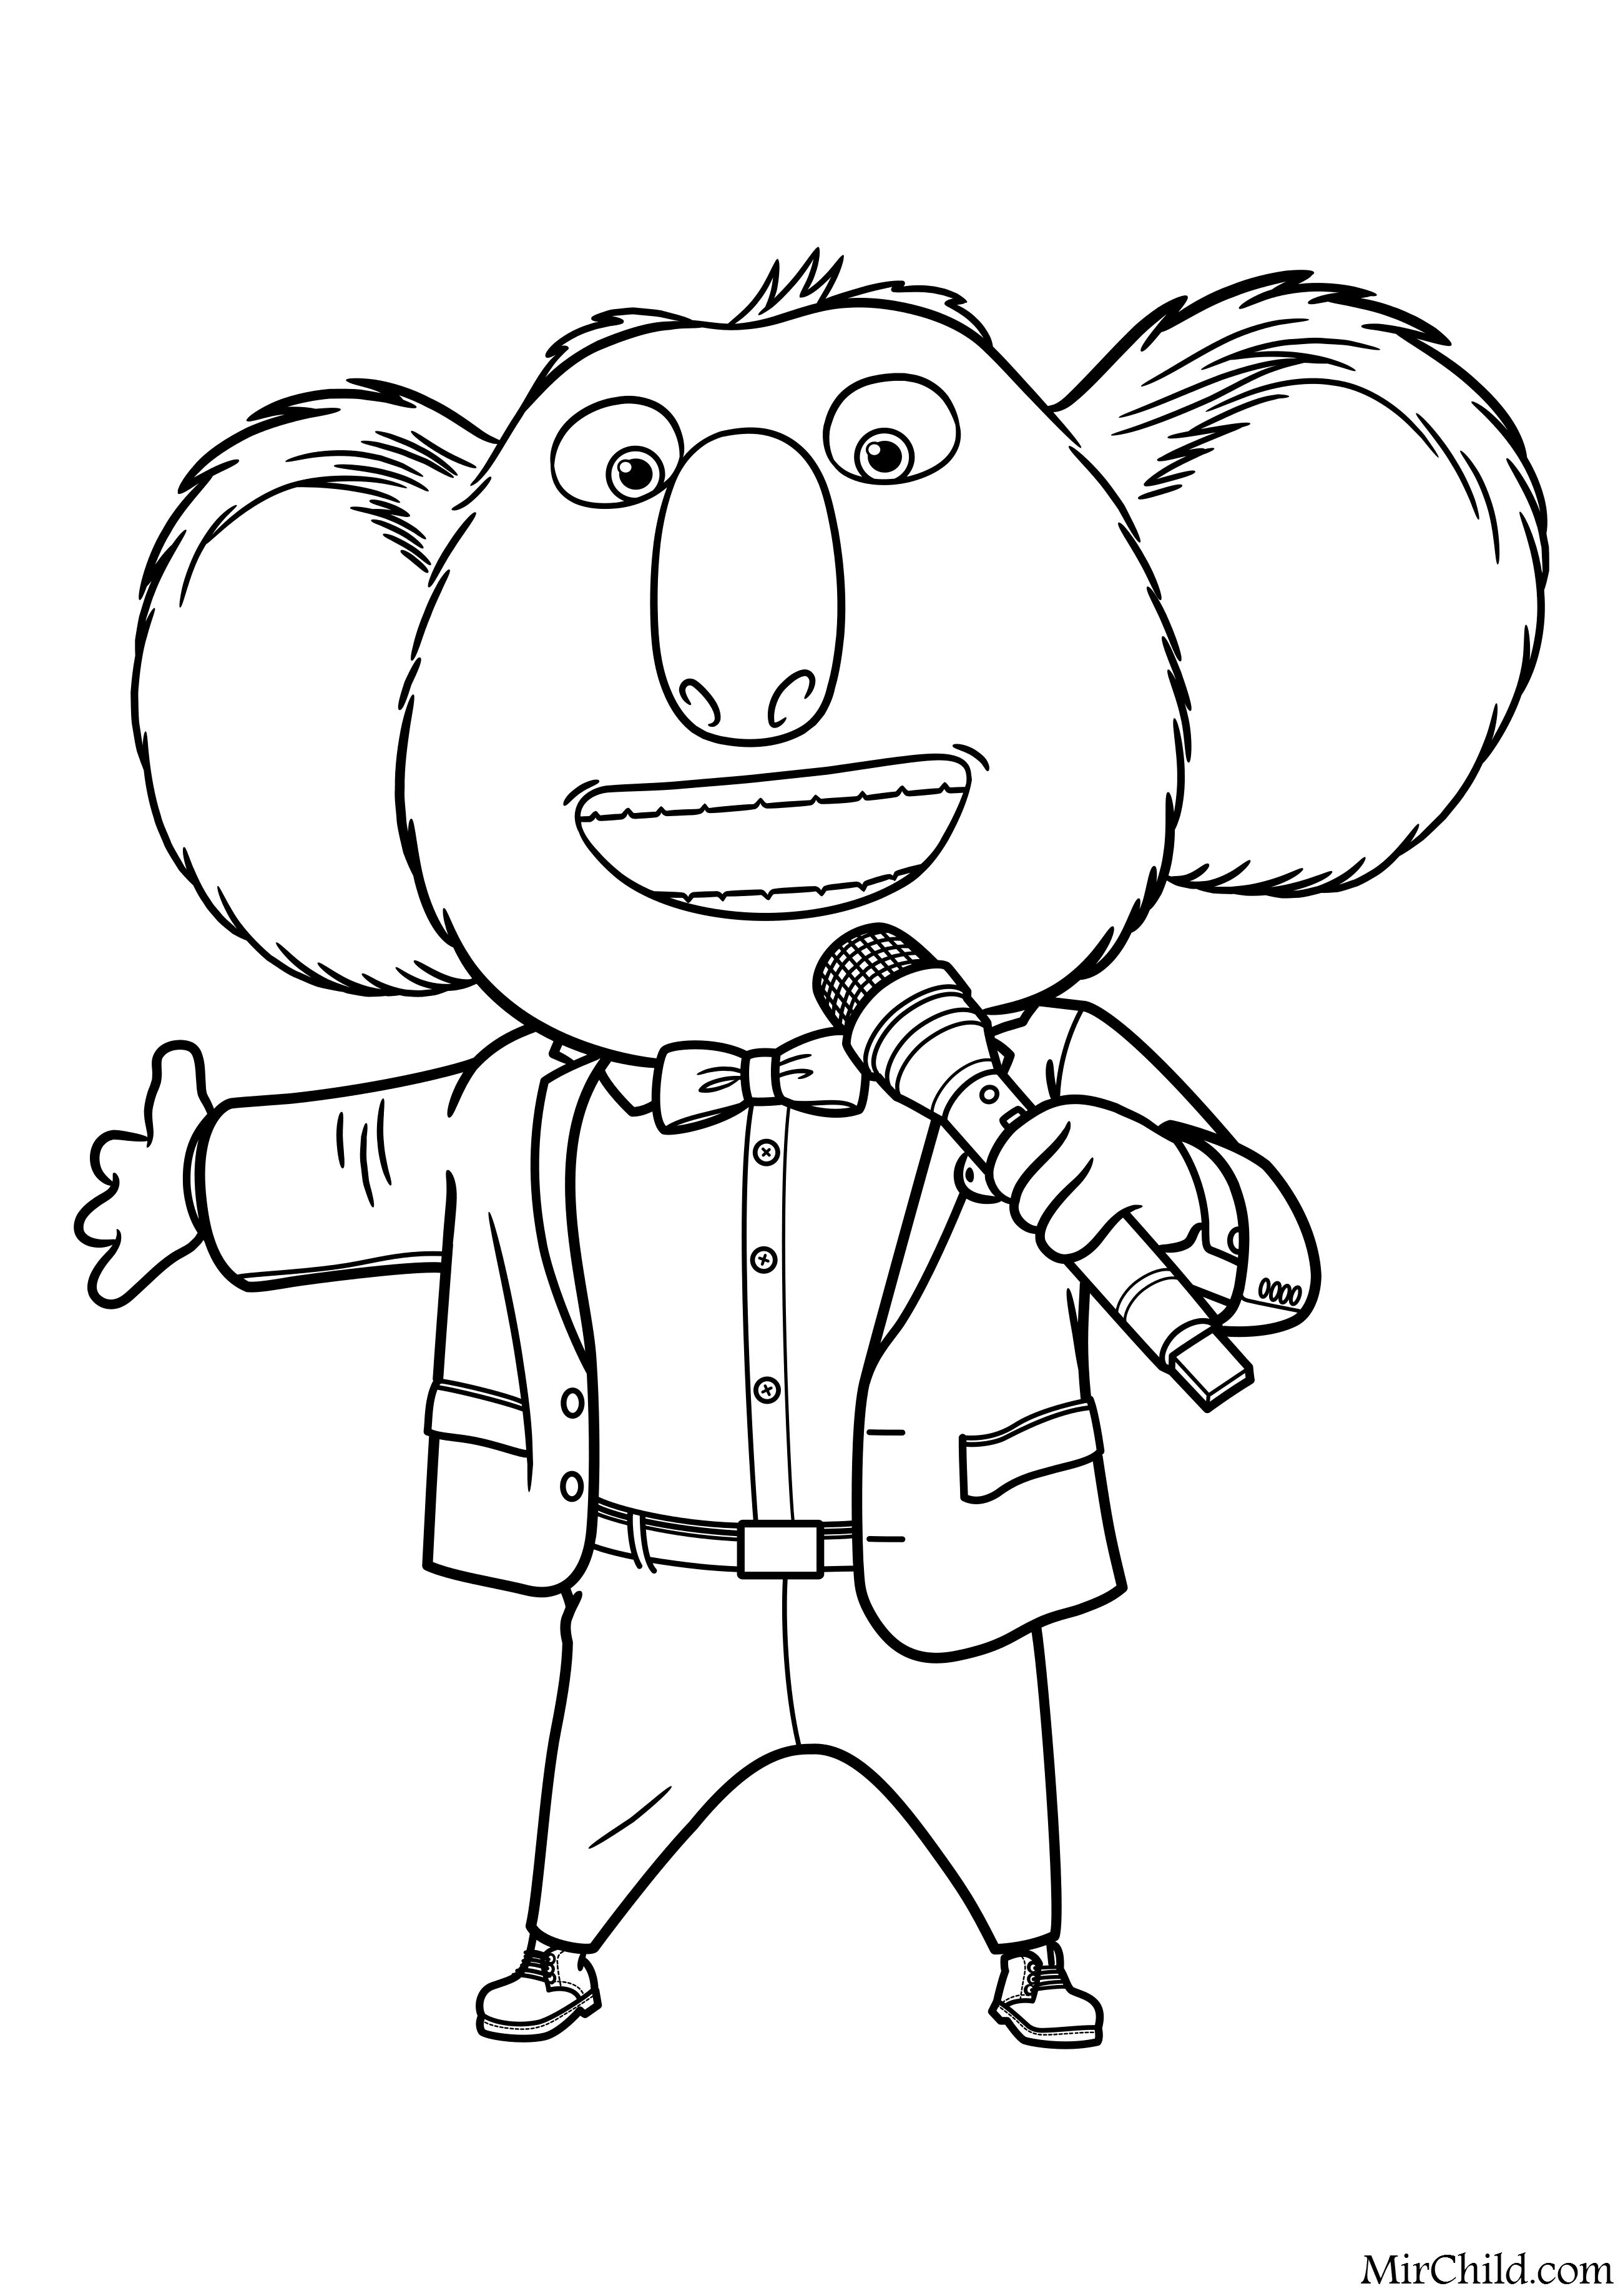 раскраска зверопой коала бастер мун Mirchild